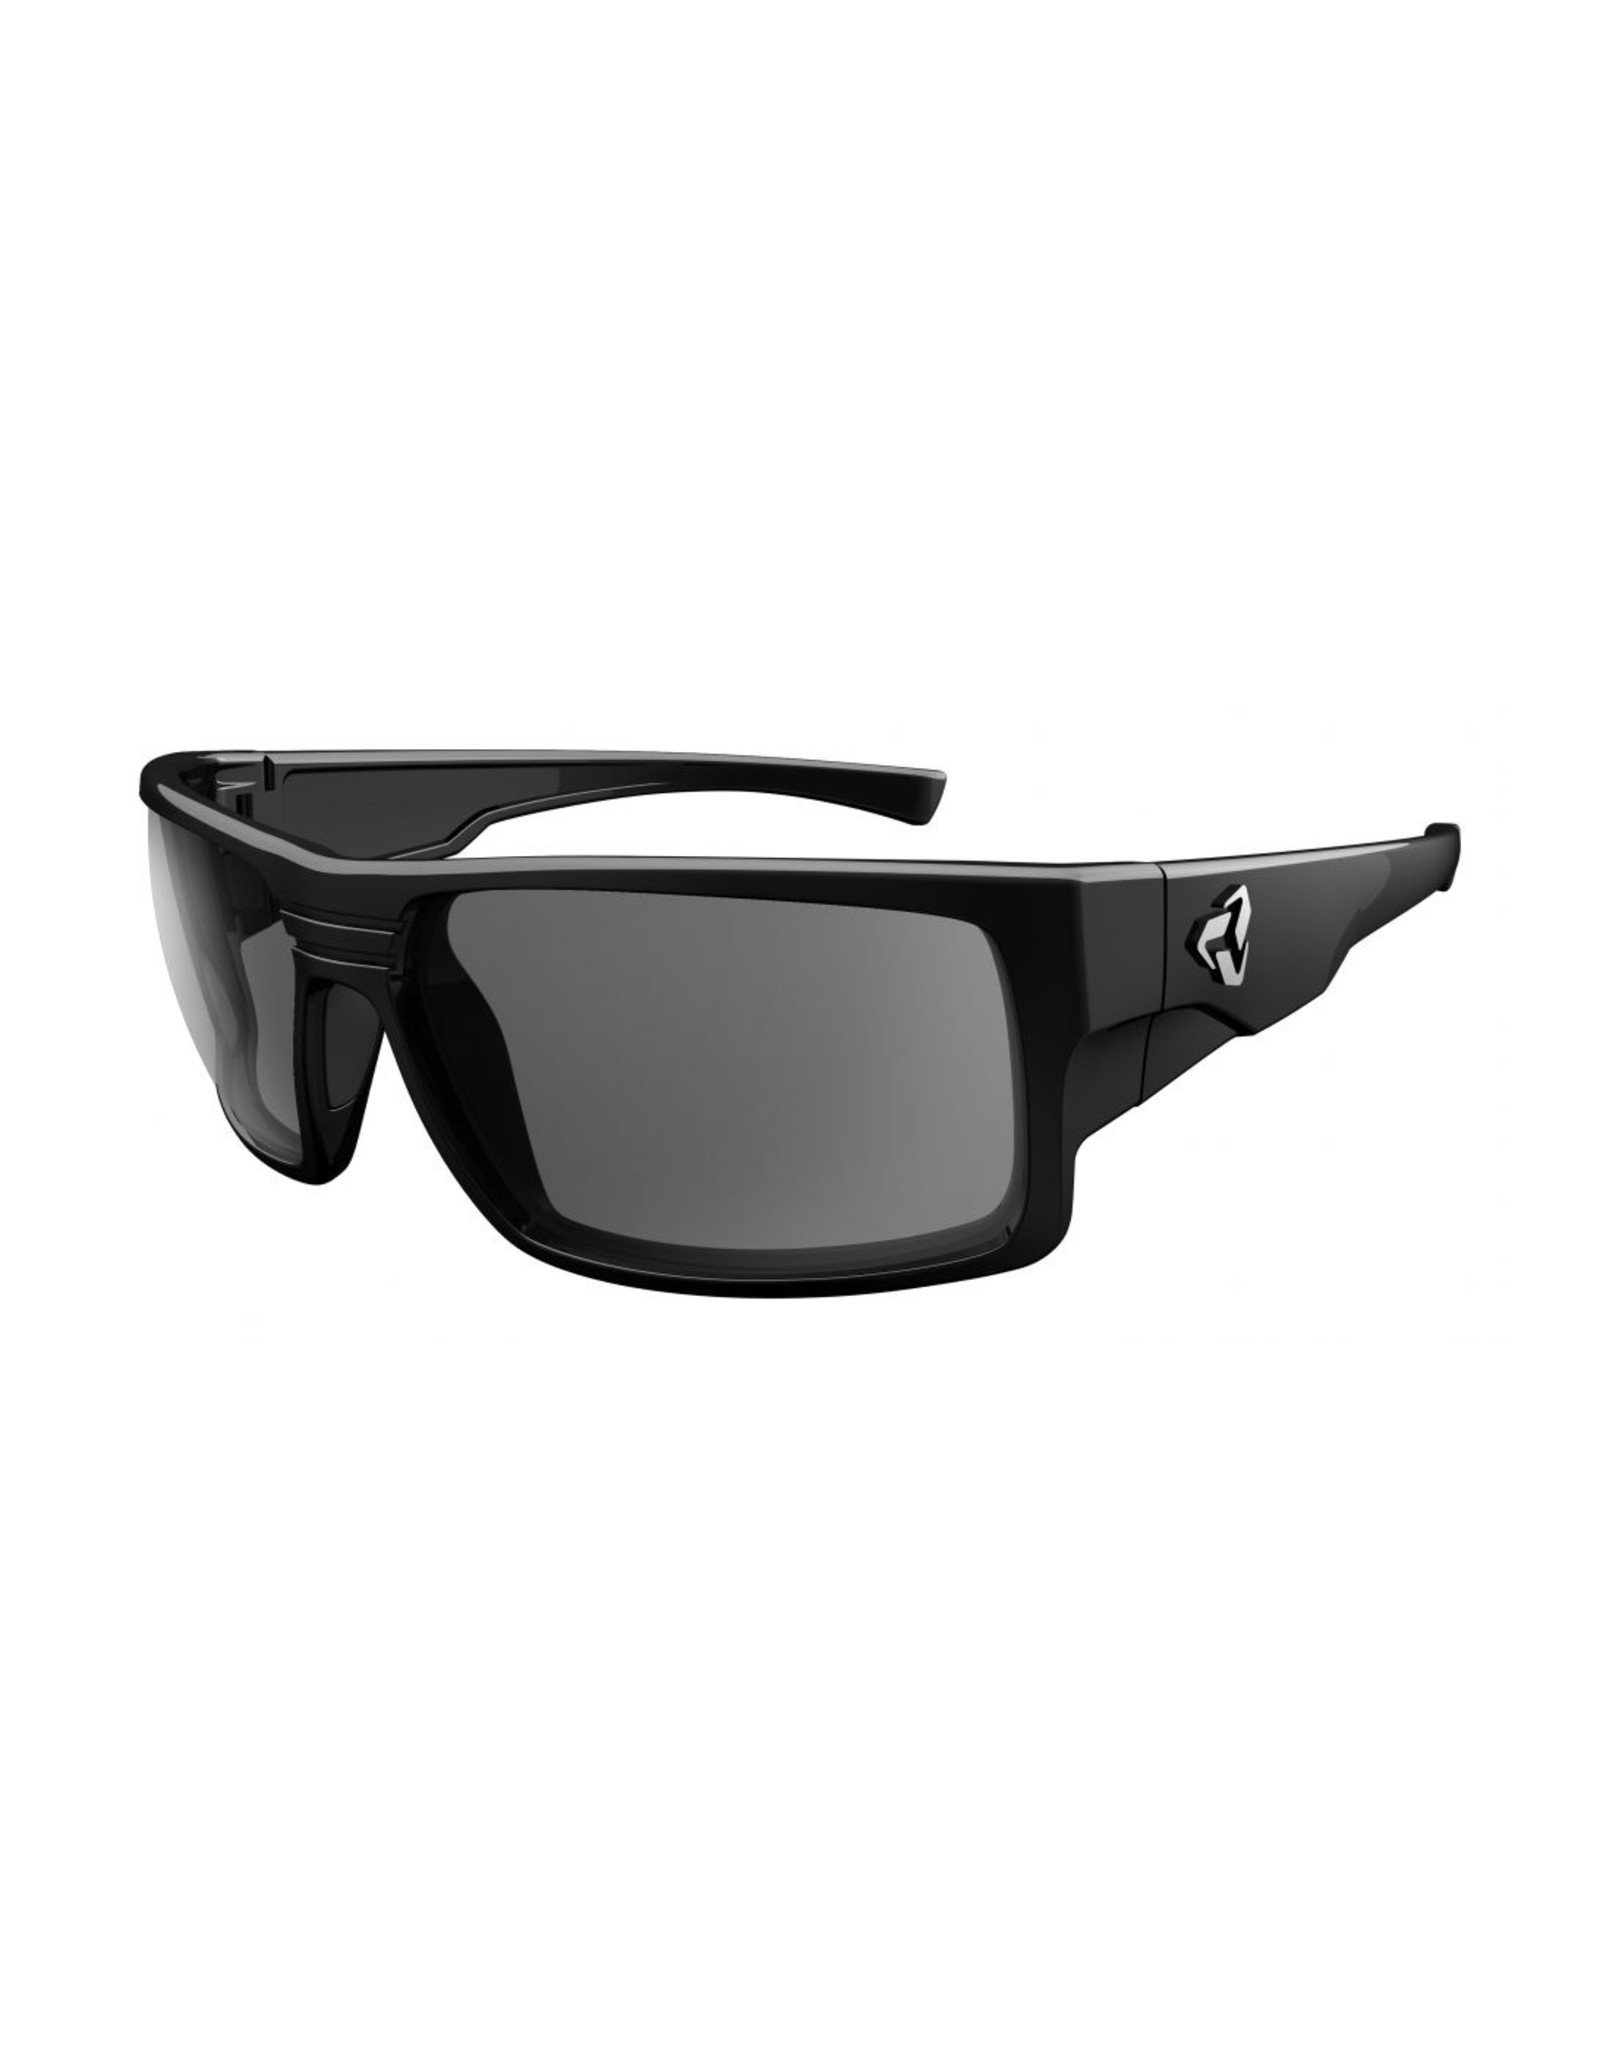 Ryders Eyewear - Thorn Polar Black/Grey Lens